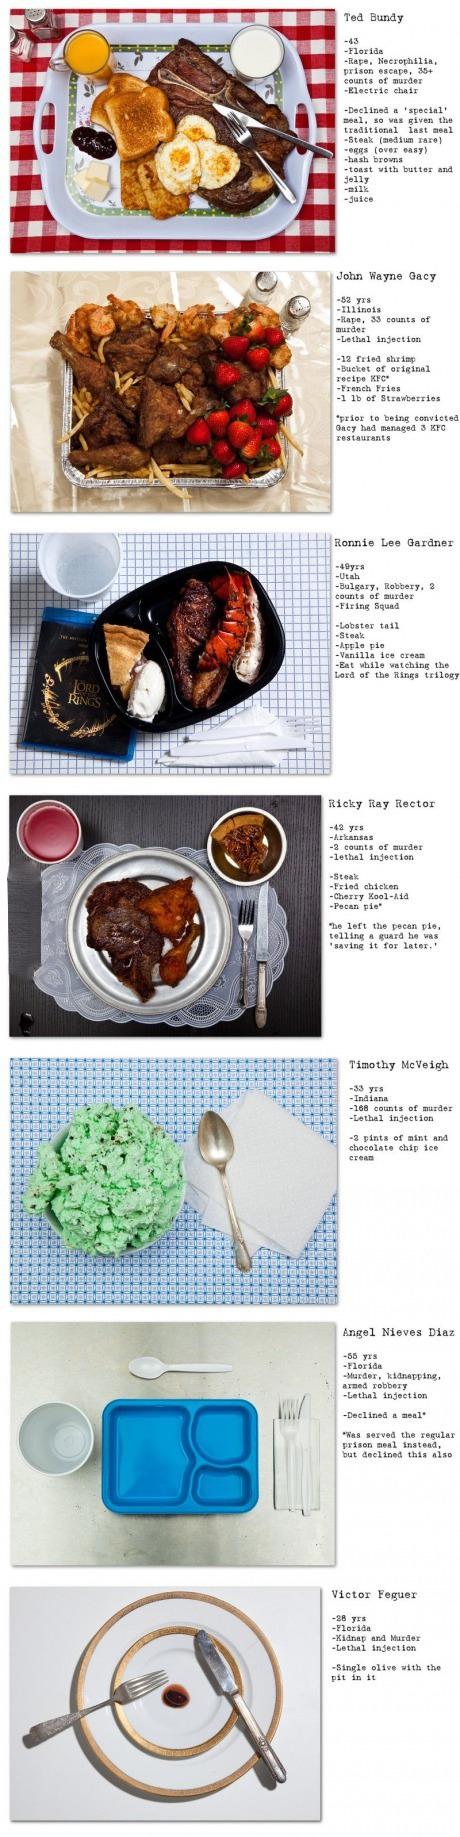 Famous Last Dinners. I'd have unicorn meat.